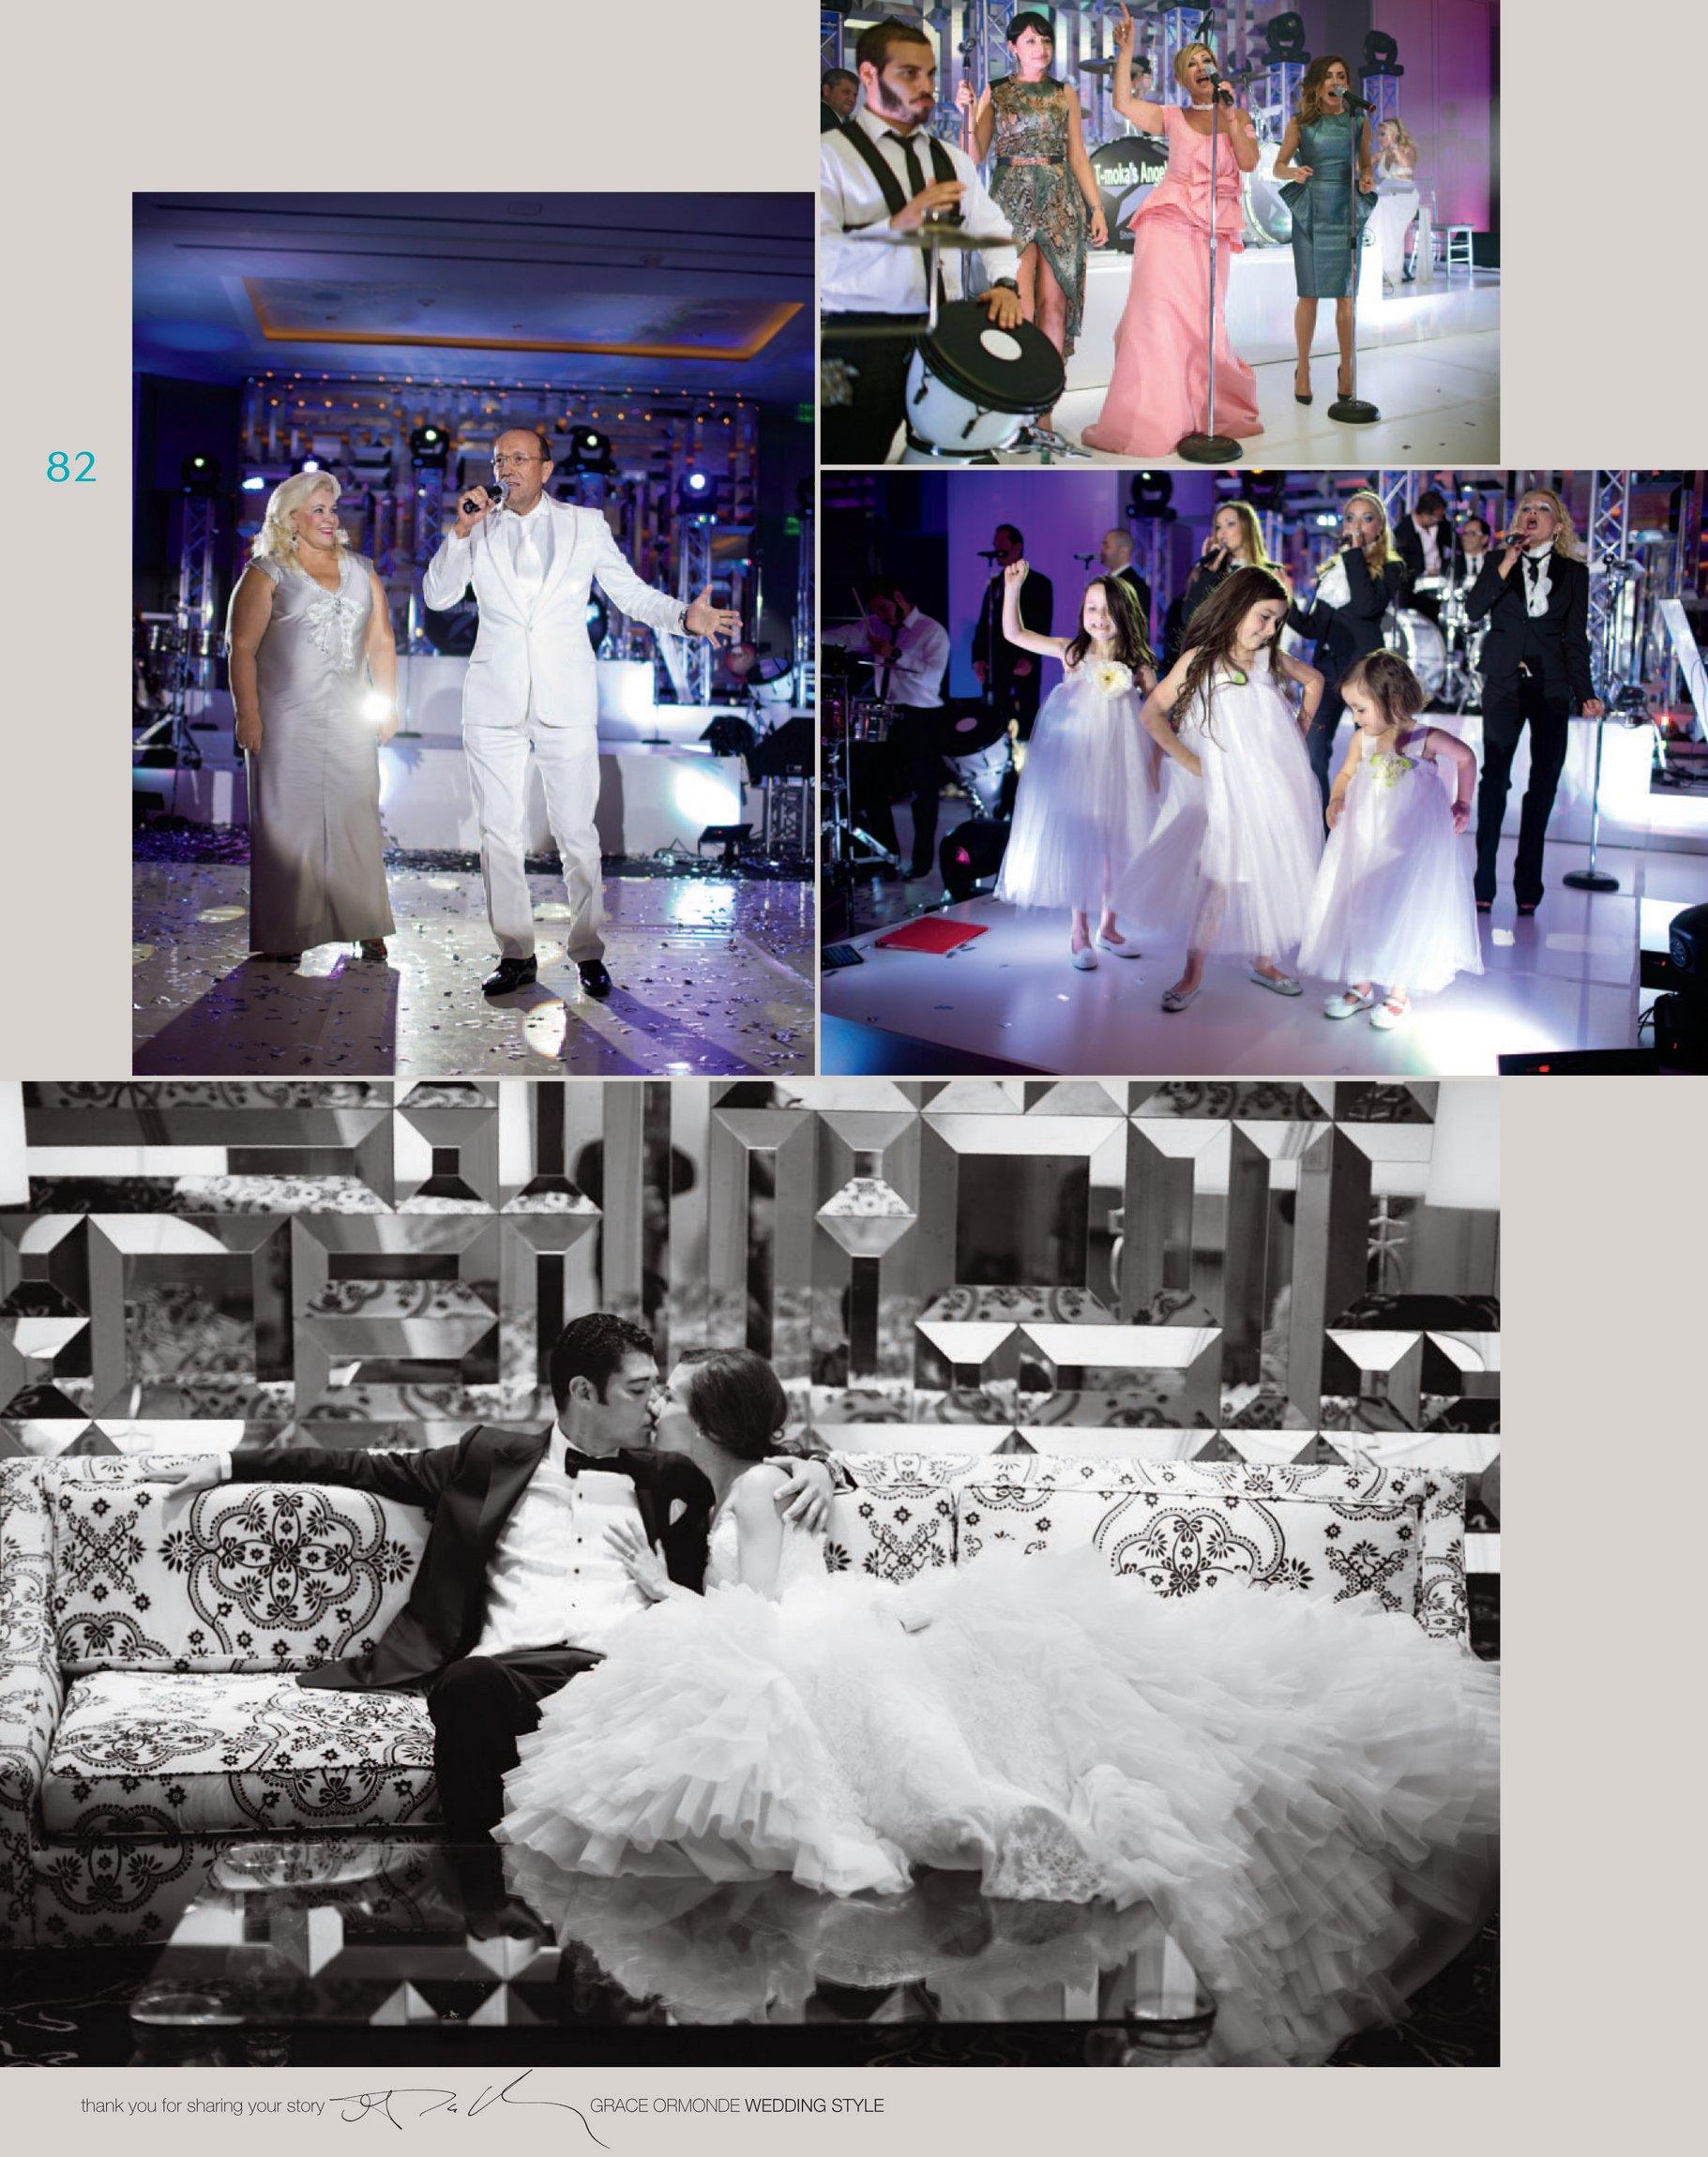 St. Regis Bal Harbor Resort, Miami – Wedding Magazine Story with Grace Ormonde, Miami Wedding Photographers | Häring Photography, Indian Wedding Photographer in Florida, Best Muslim, Hindu - South East Asian Wedding Photographers